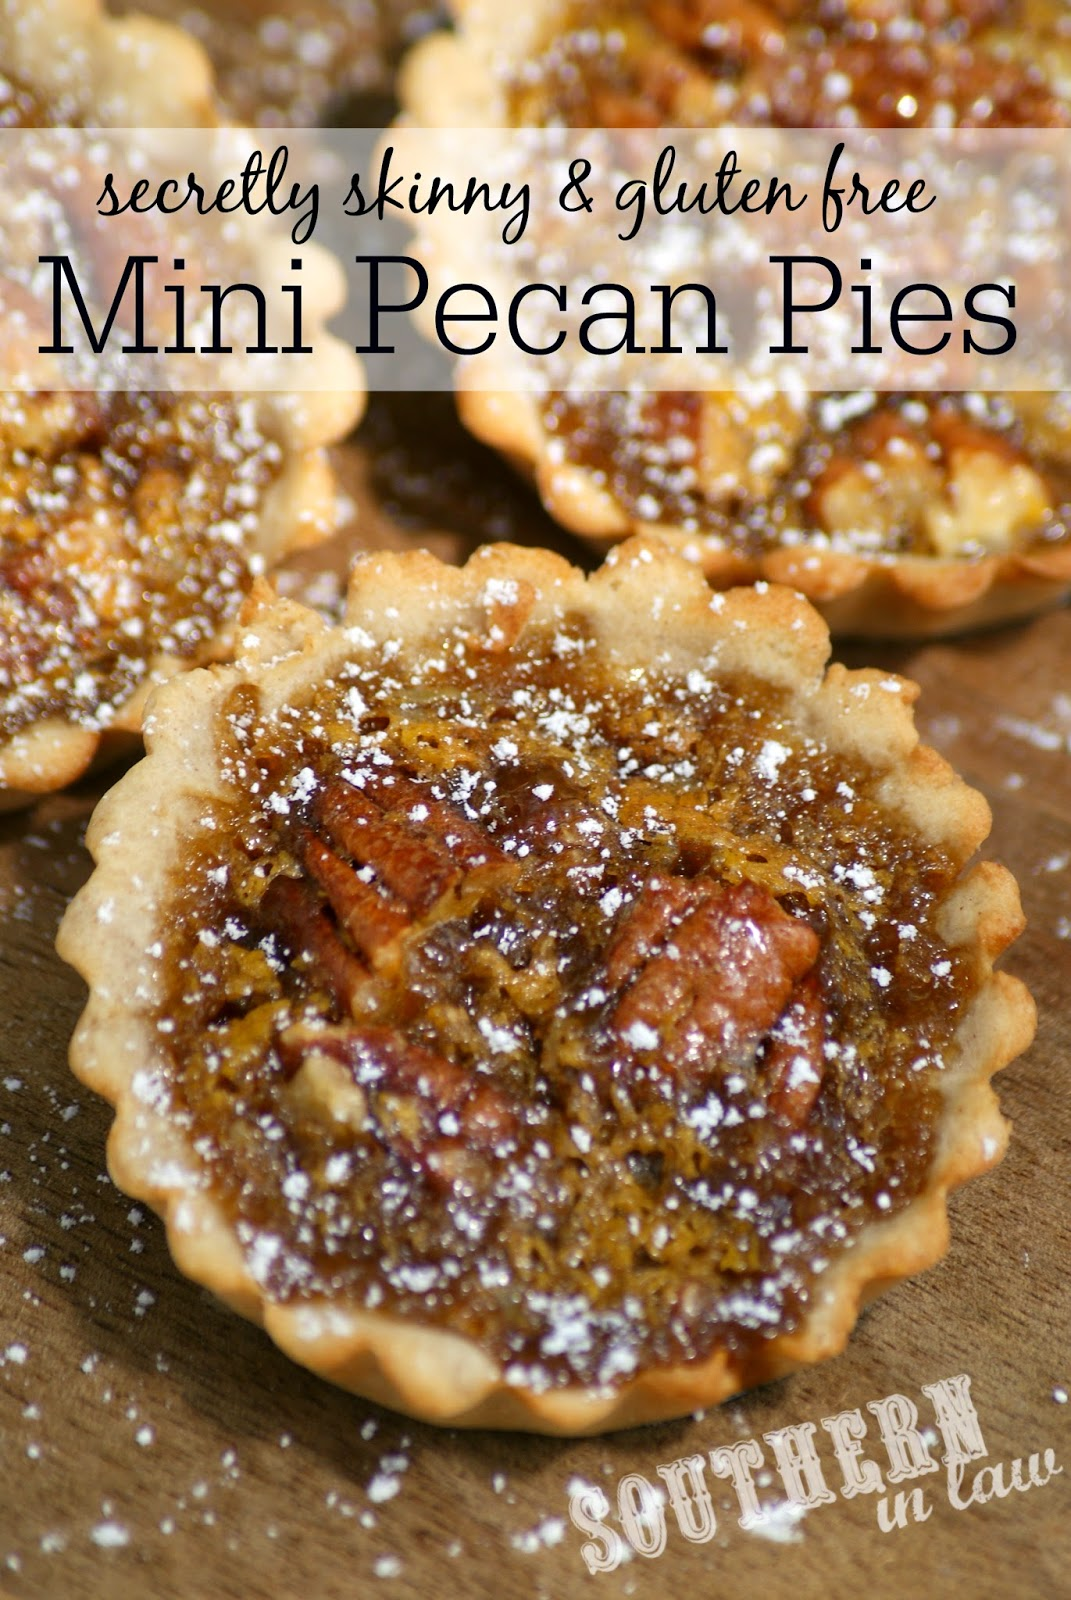 Healthier Mini Pecan Pies Recipe - Low fat, gluten free, lower sugar, easy to make